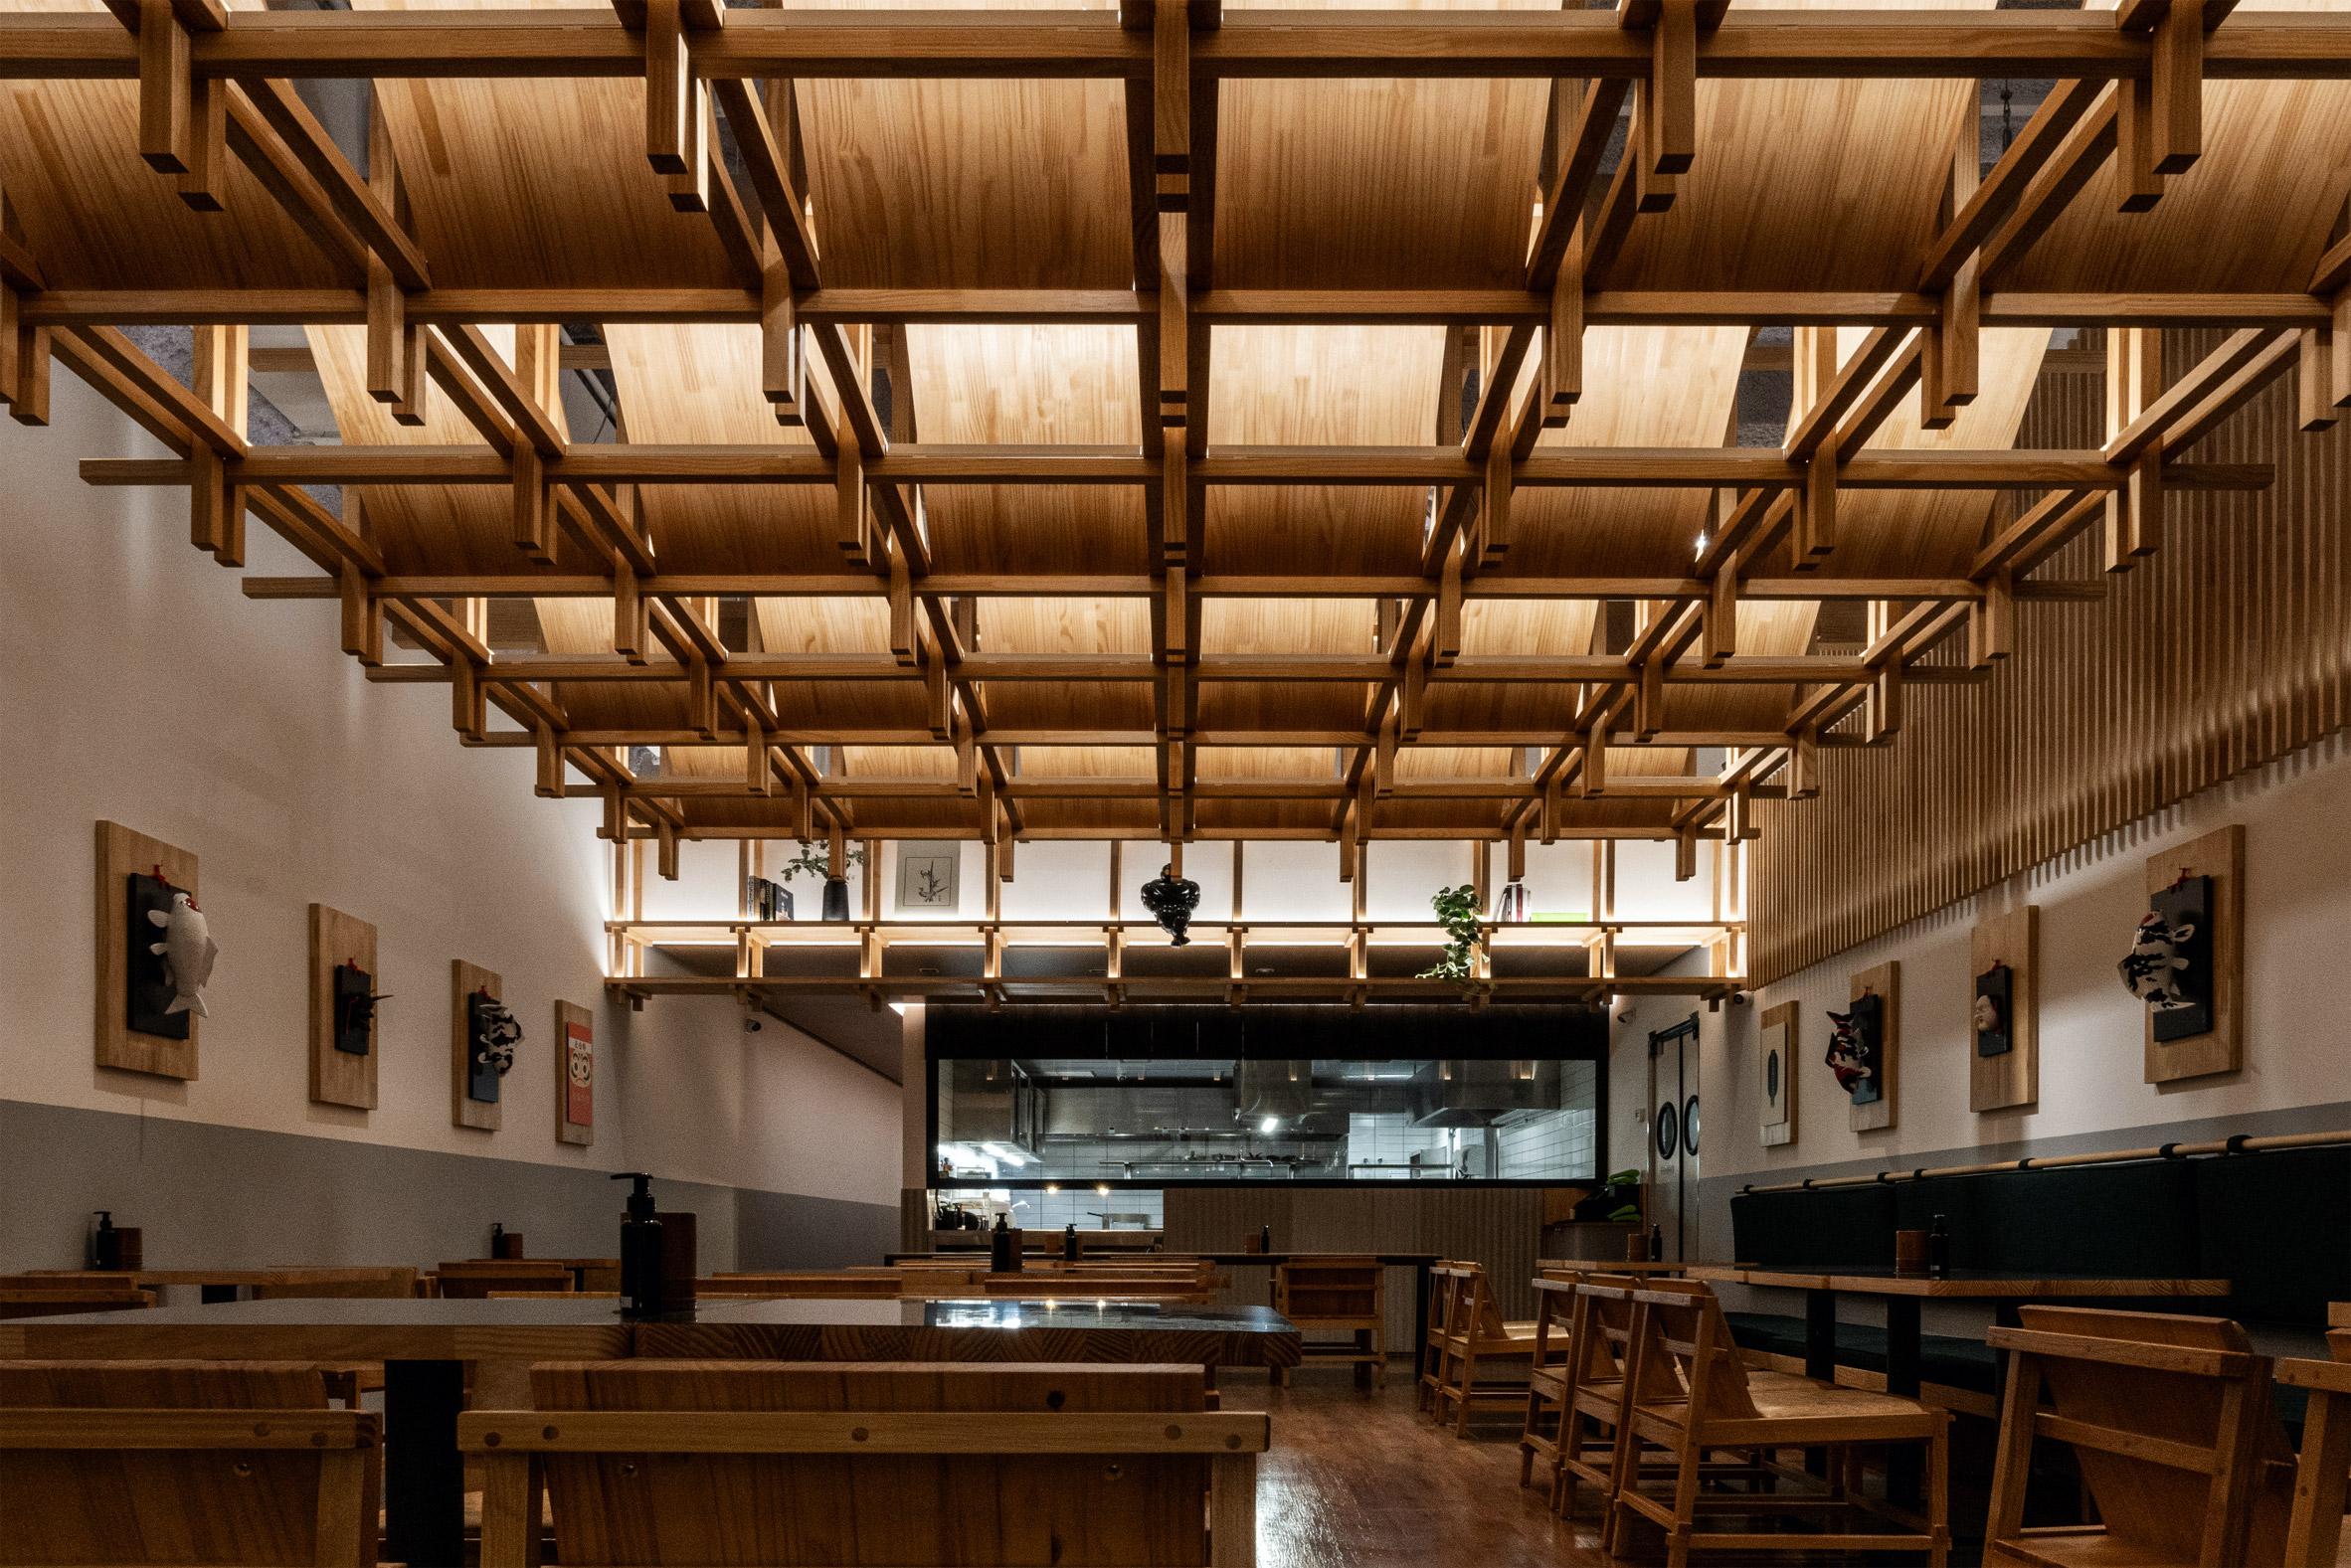 Restaurant interior design in São Paulo with wooden canopy